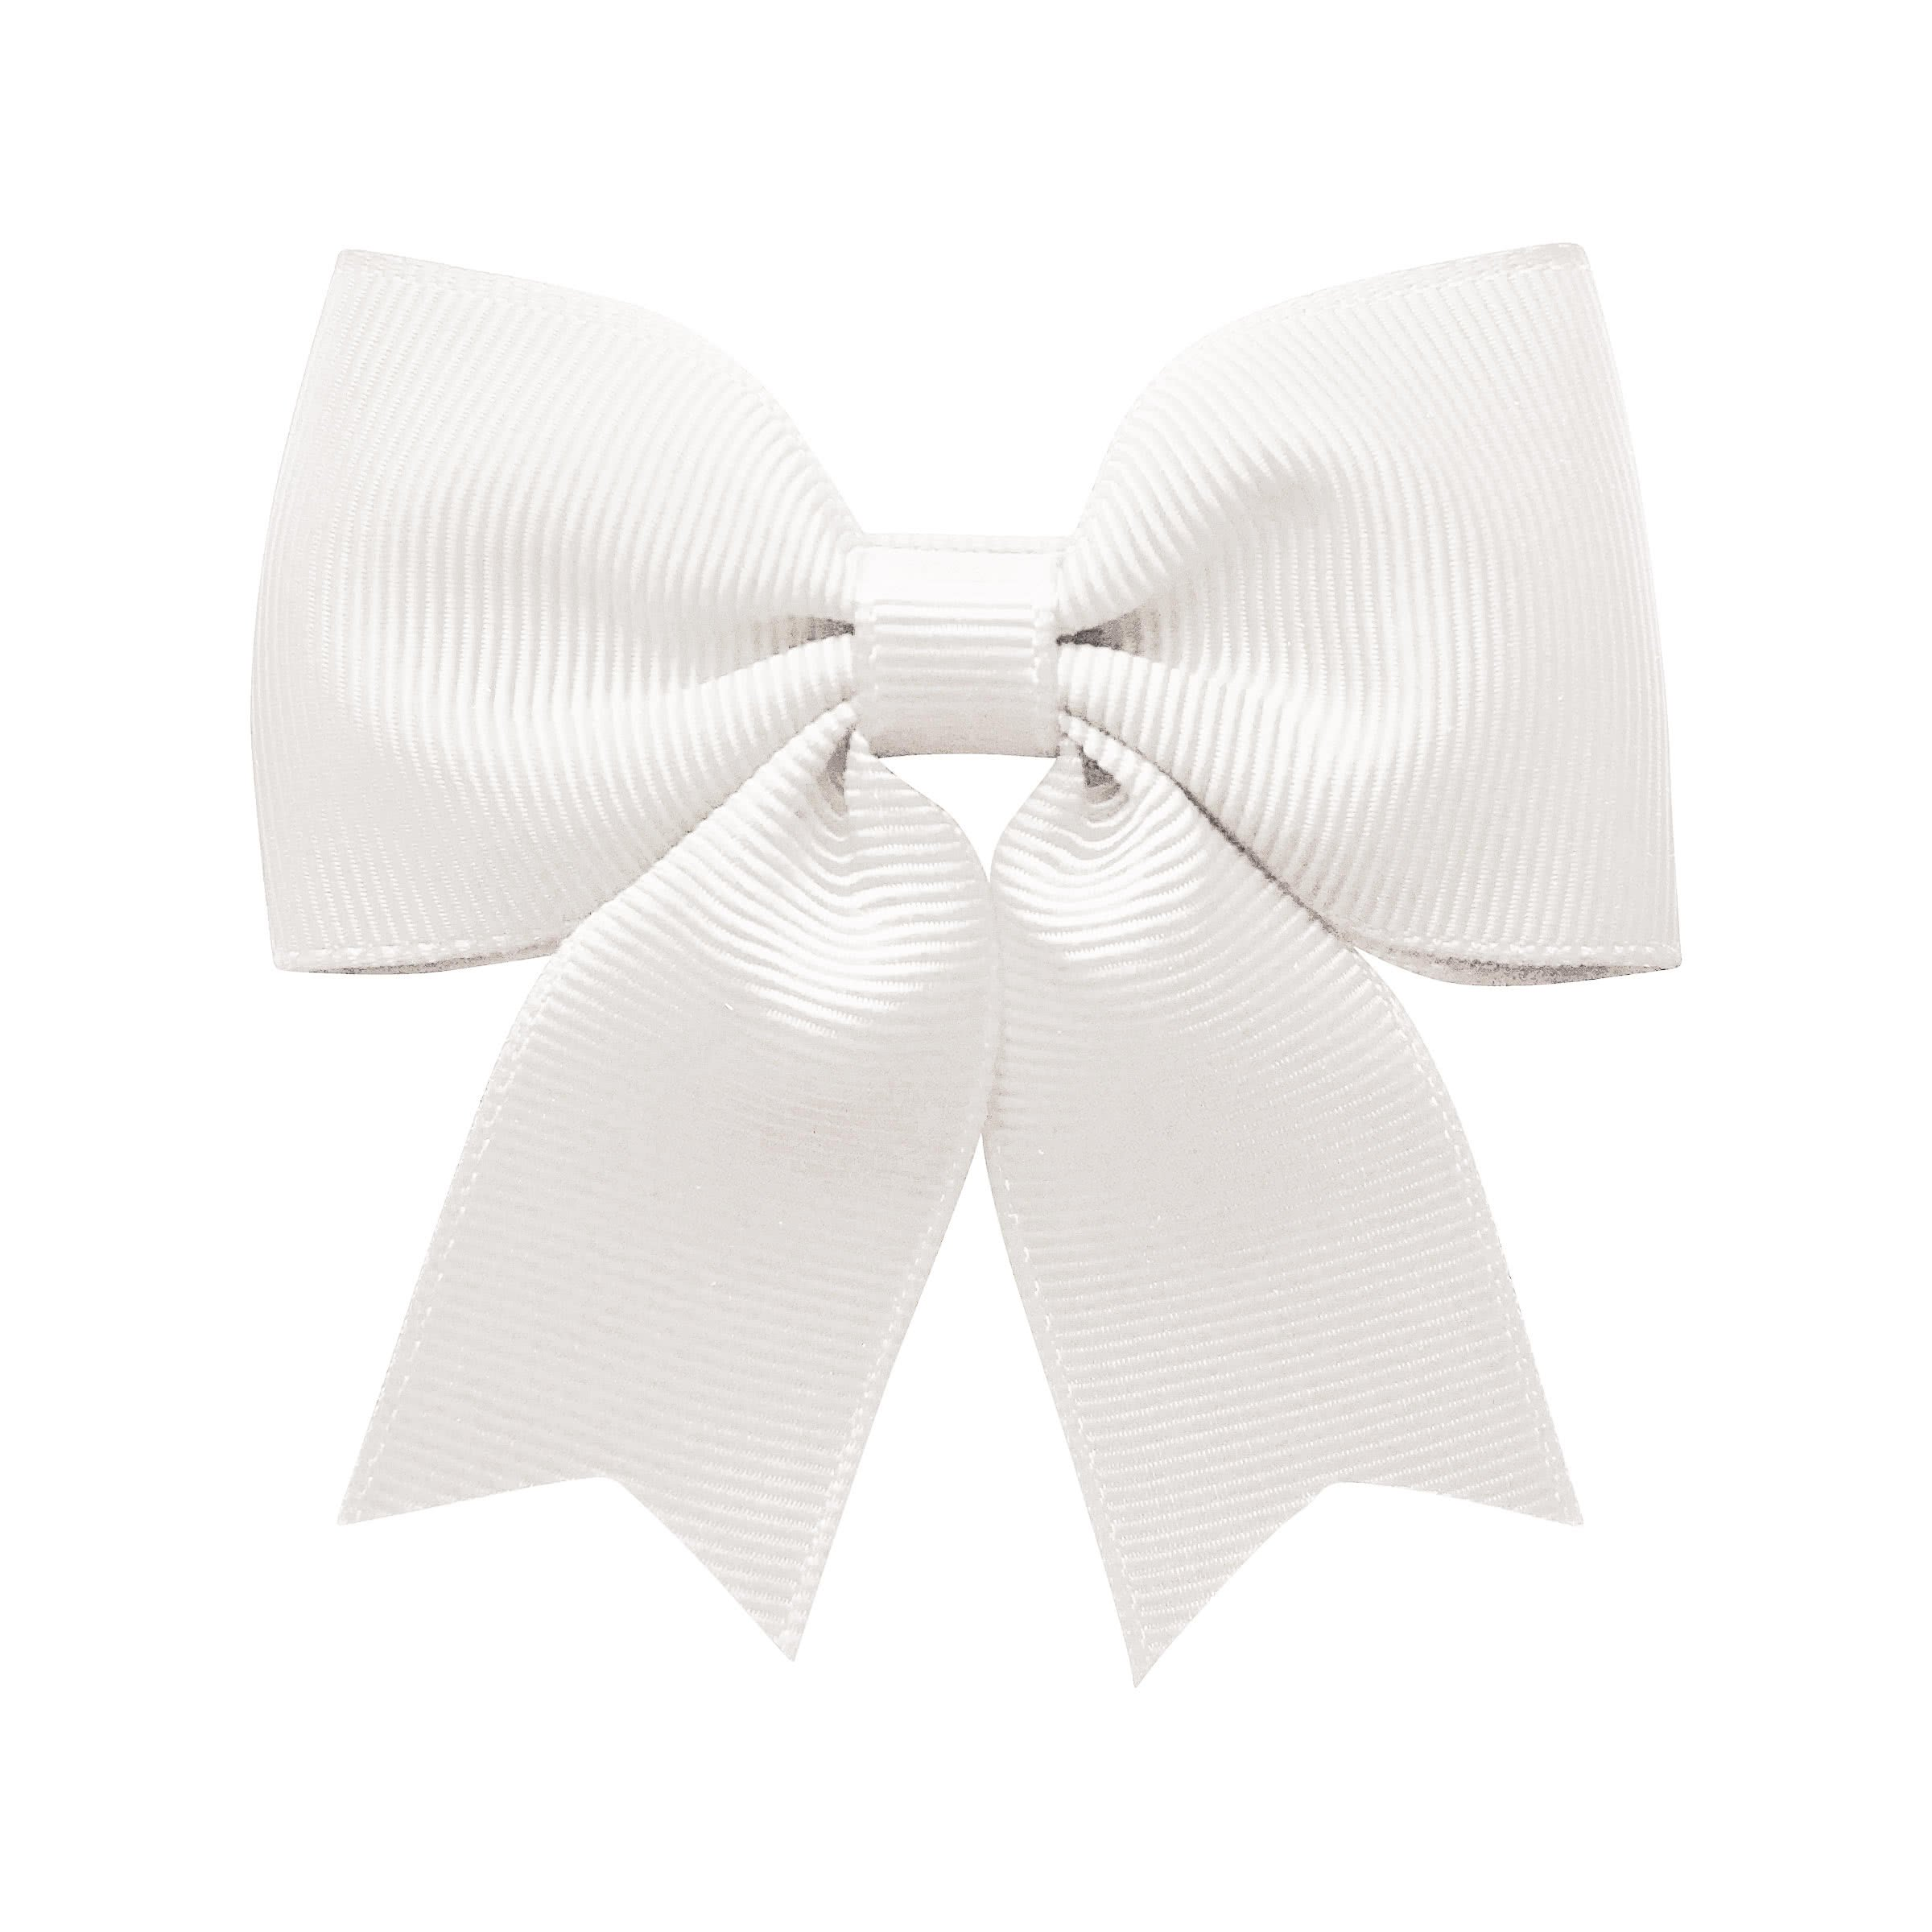 Medium bowtie bow w/ tails - alligator clip - white